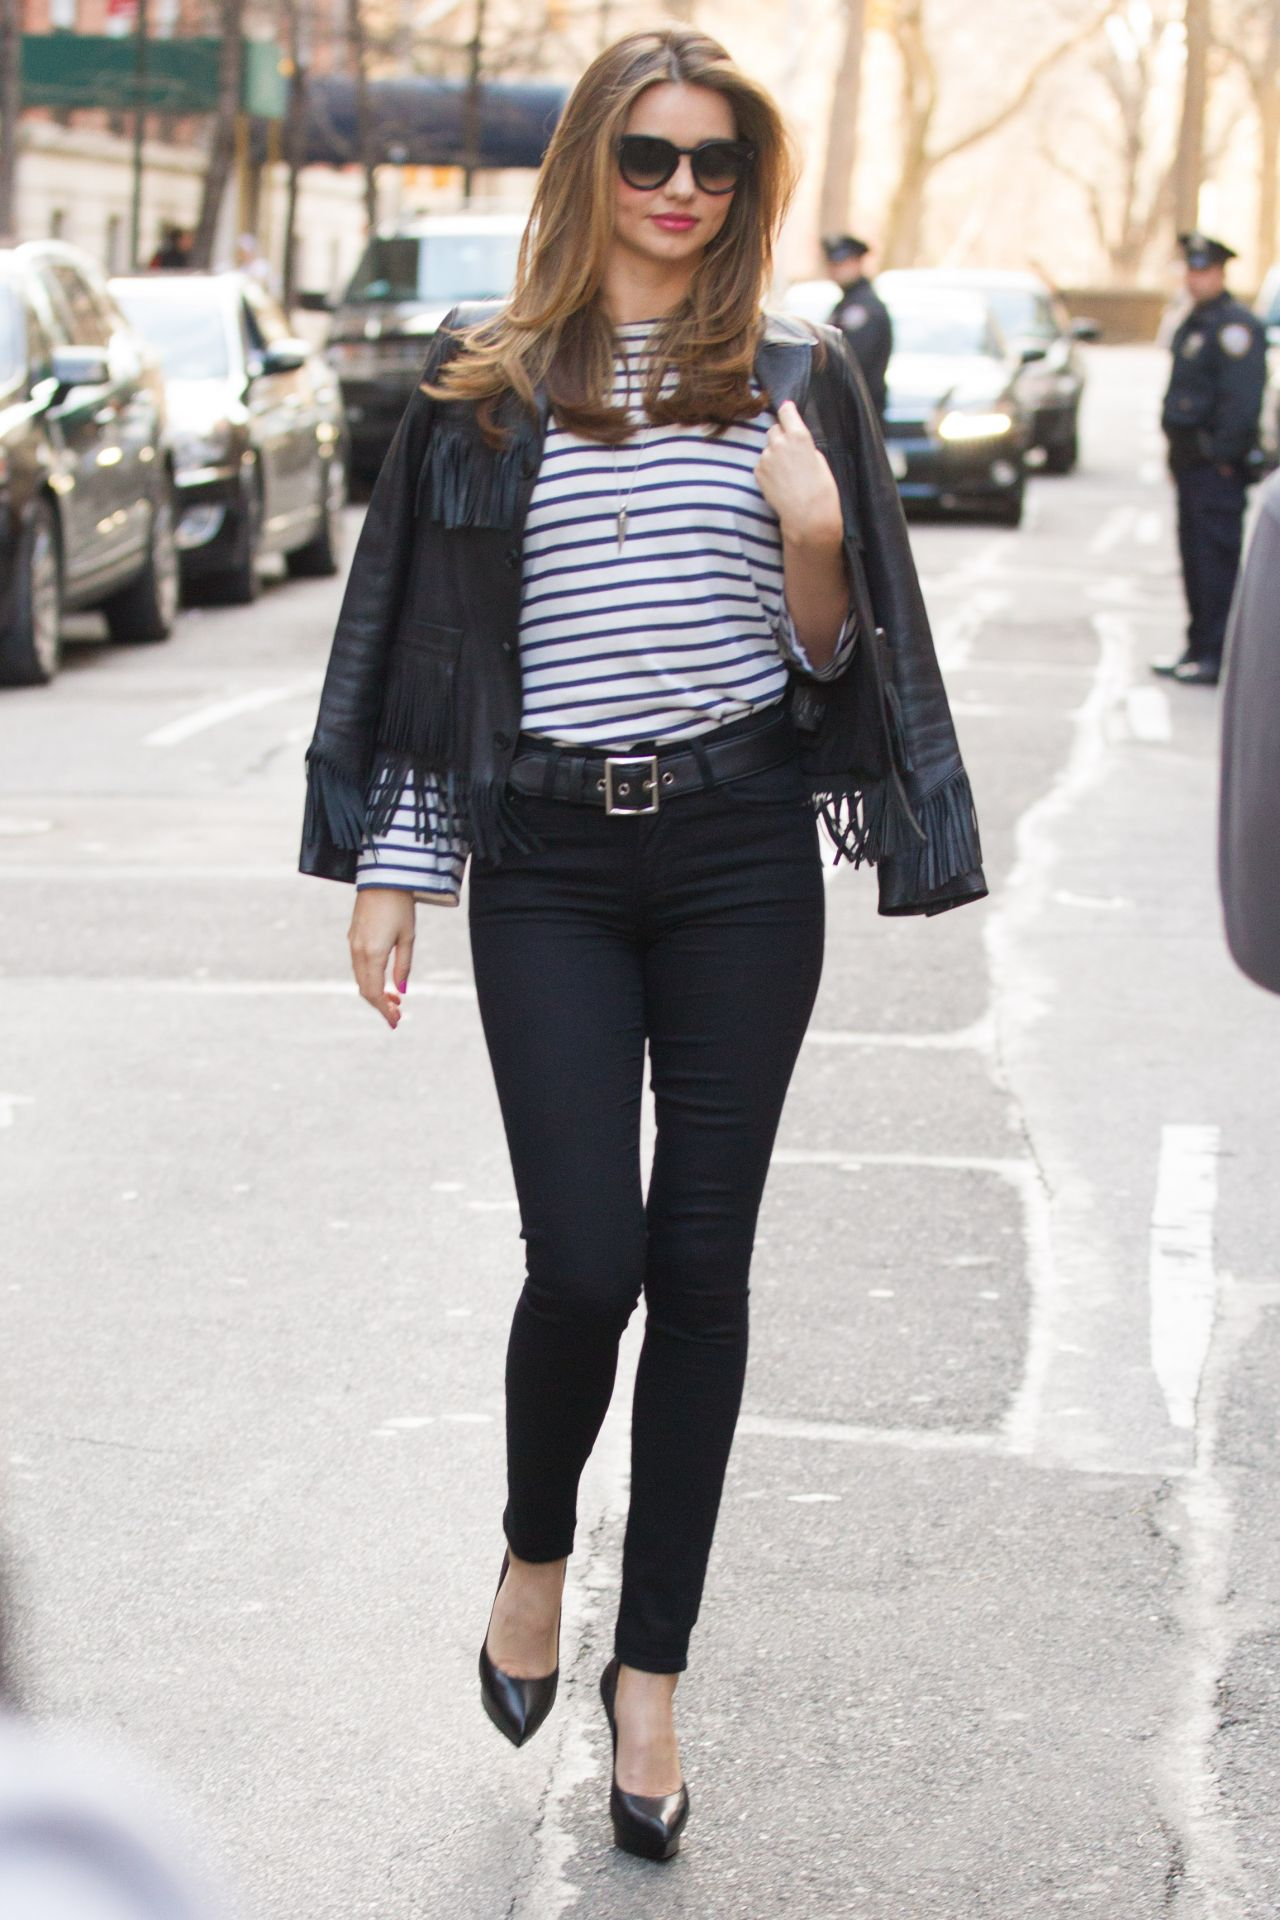 Miranda Kerr In New York City Filming A Commercial